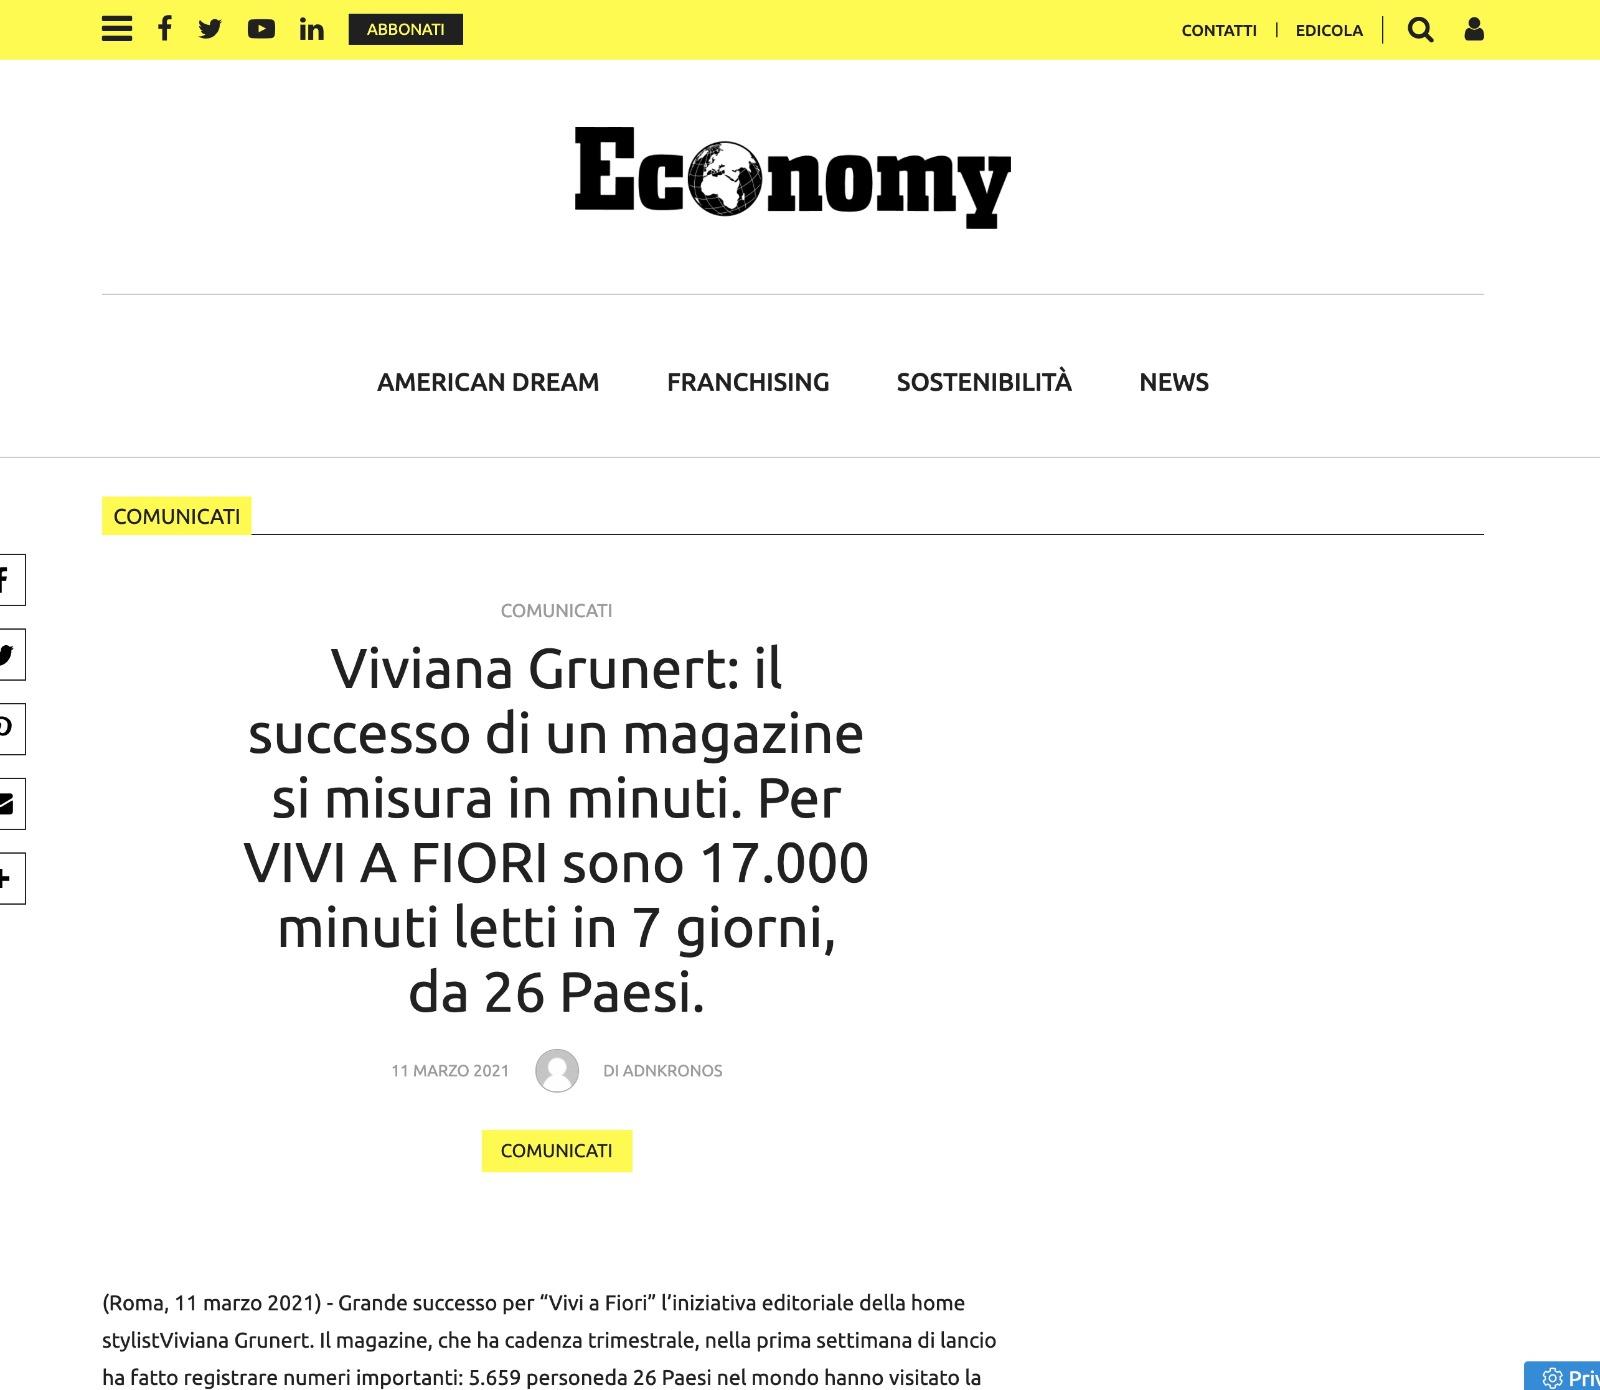 Viviana Grunert su ECONOMY-11.03.2021